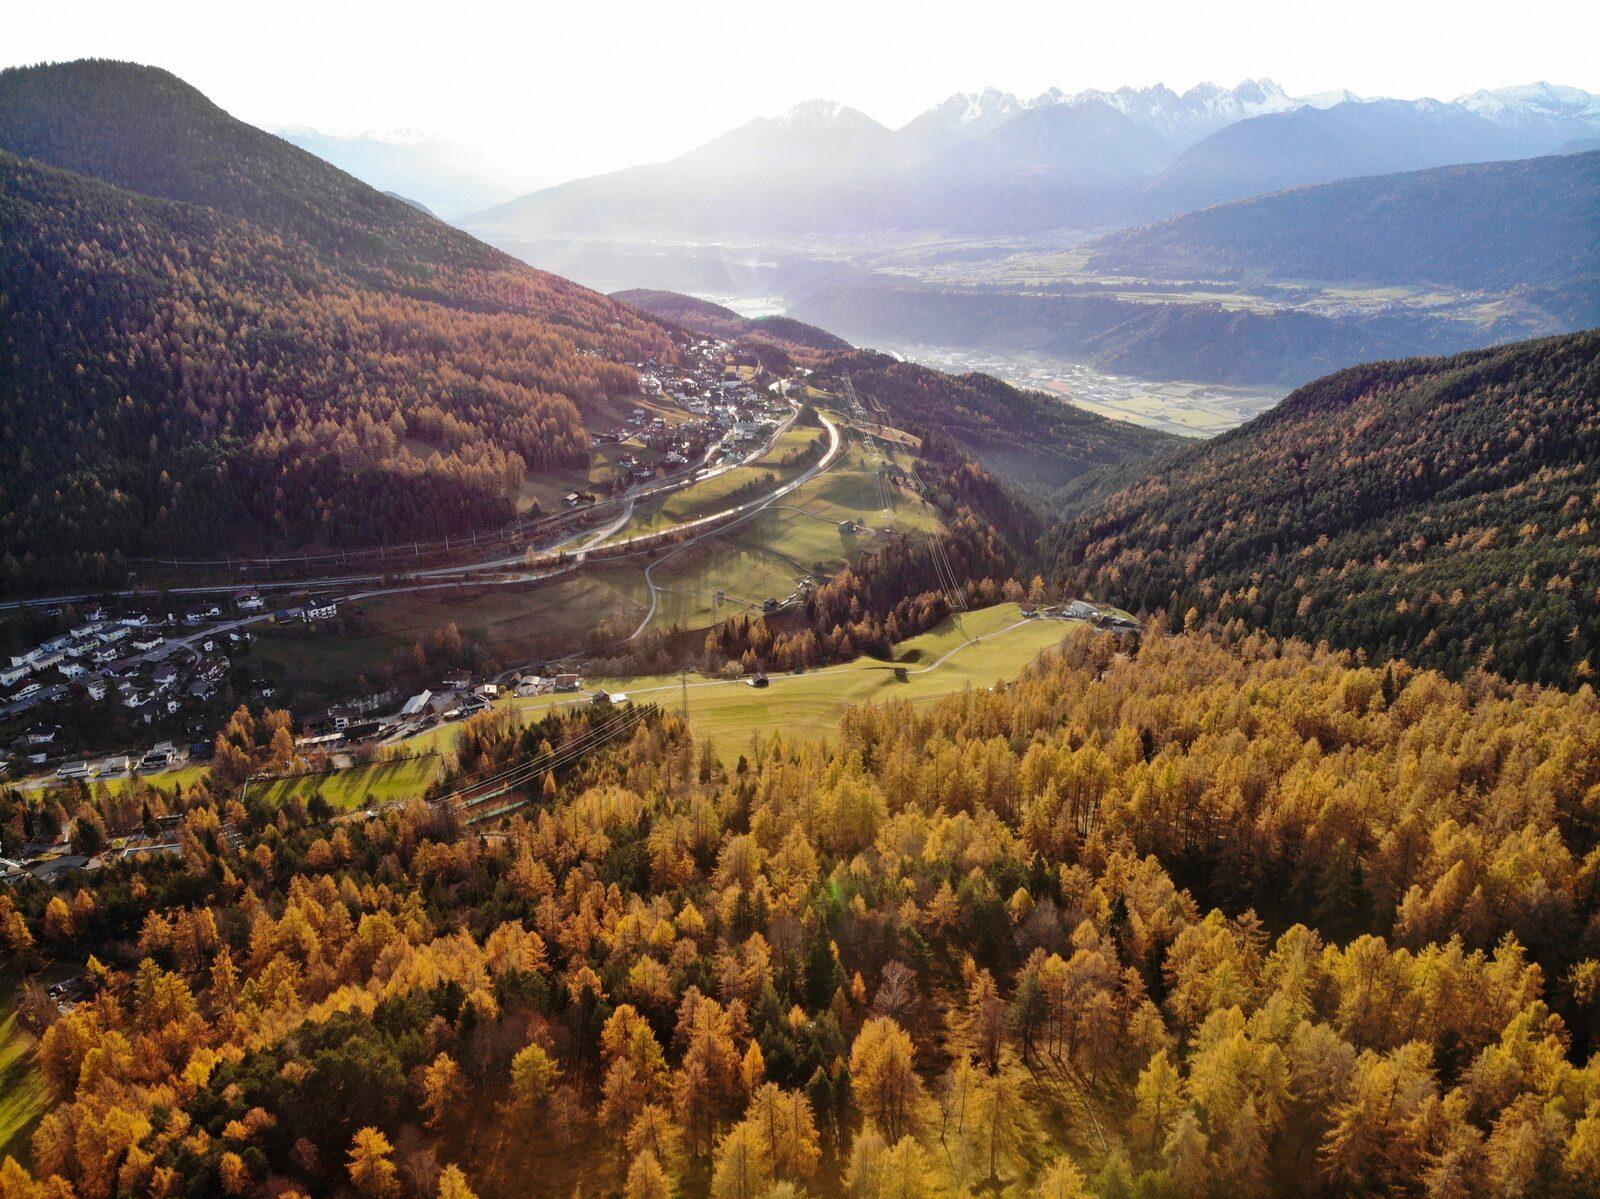 Herbstferien in Seefeld, Österreich